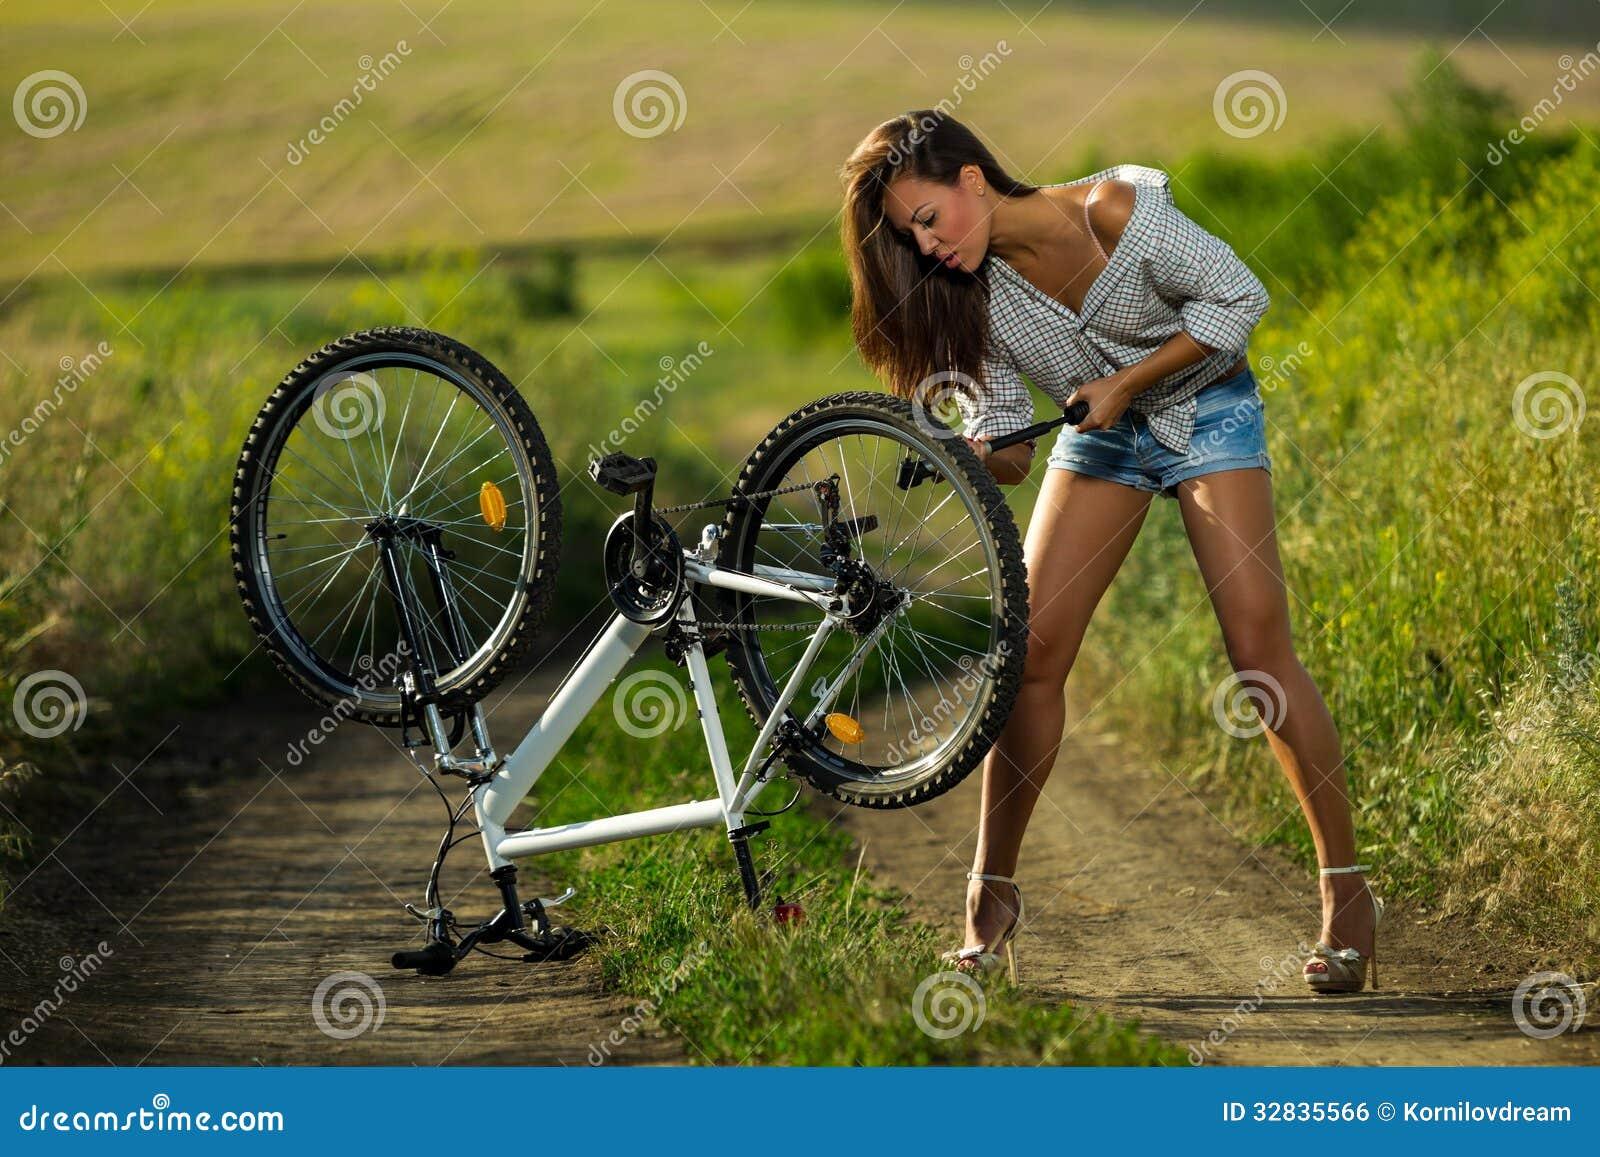 Sexy Radfahrer Lizenzfreies Stockbild - Bild: 32835566